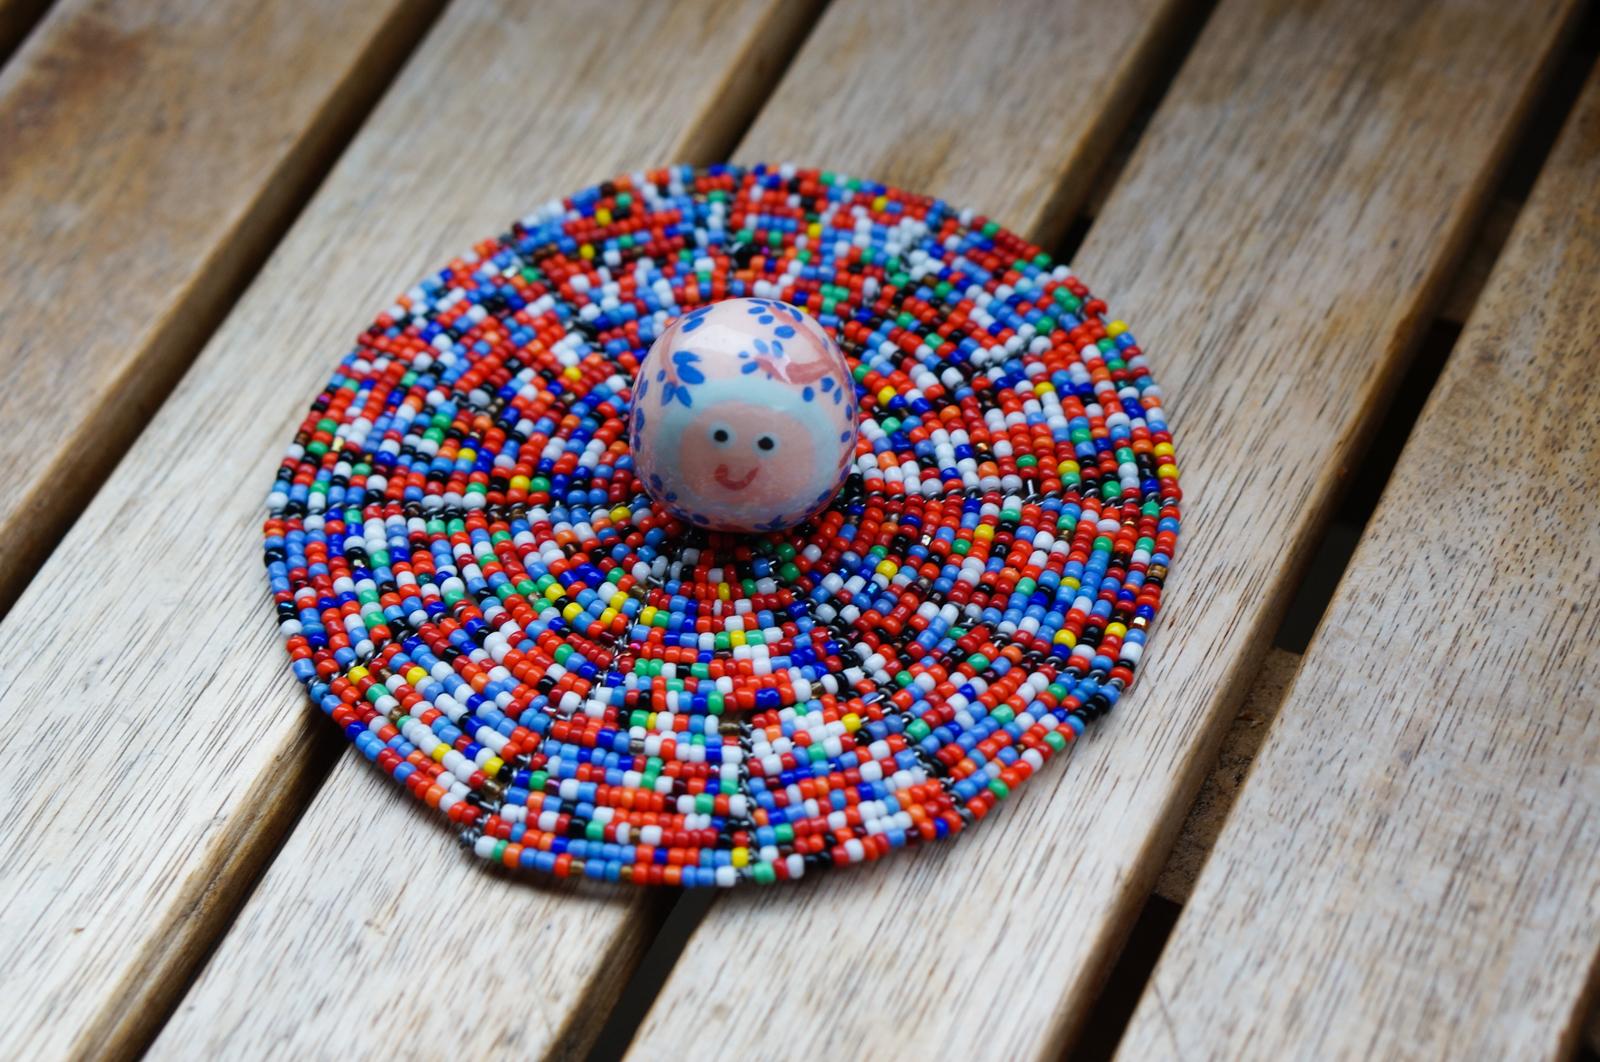 vide-grenier paris, vide-grenier, brocante, brocante paris, chiner paris,sous-verre perles